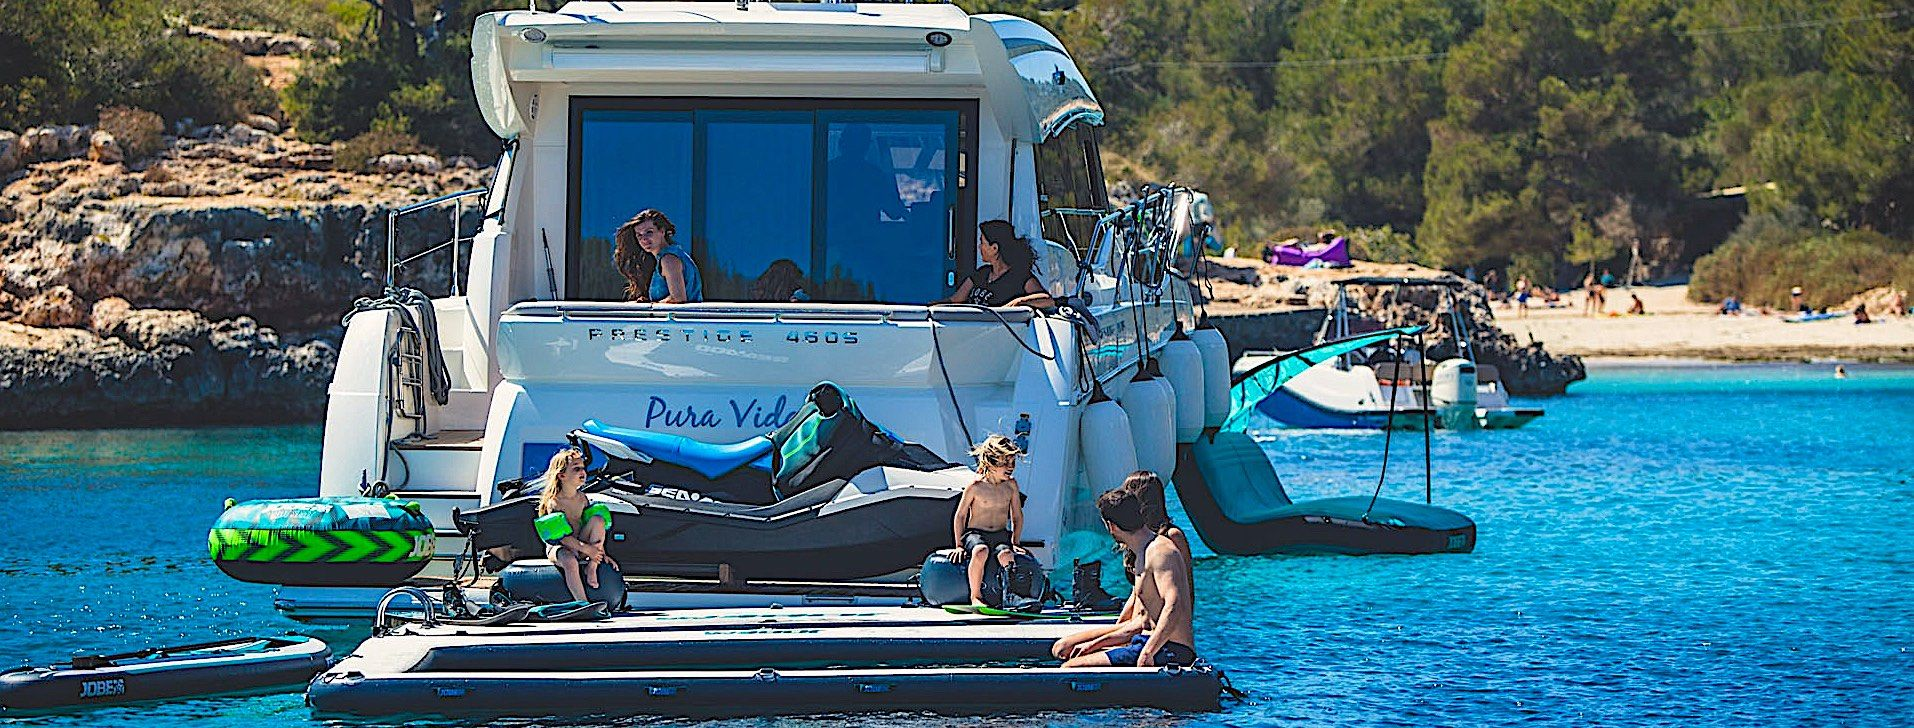 Yacht extension de Platform Pool extention - Yacht Toys & Water Sports Equipment